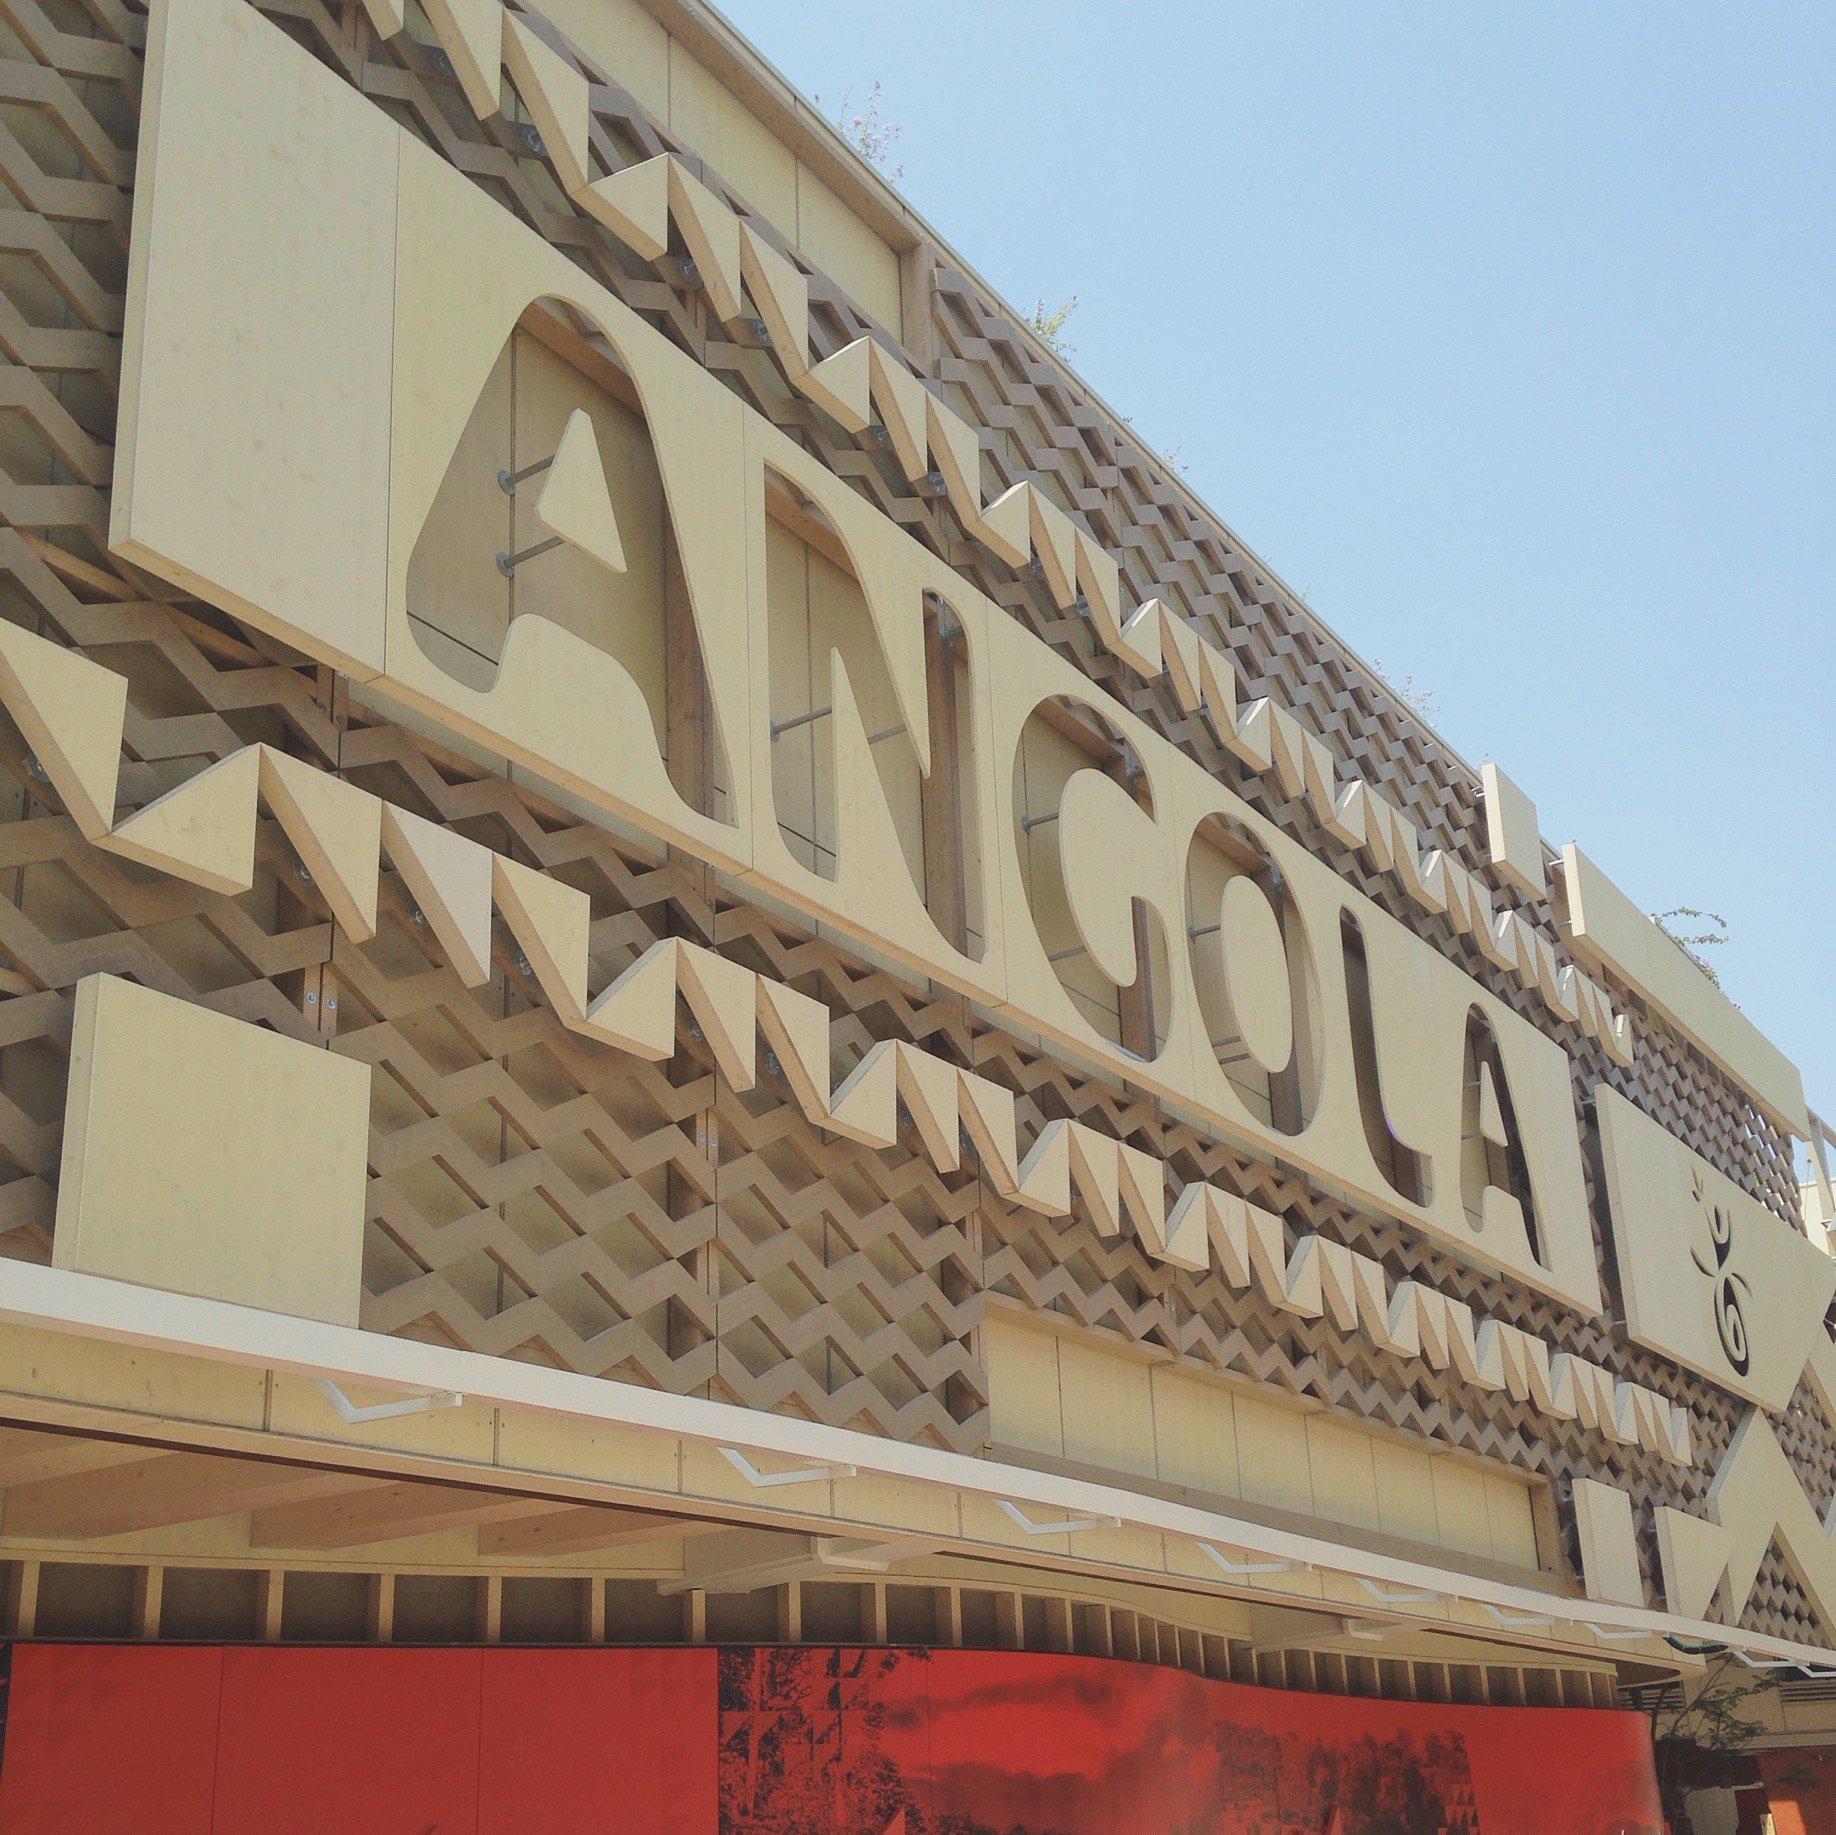 INGRIDESIGN EXPO milan 2015 angola structure